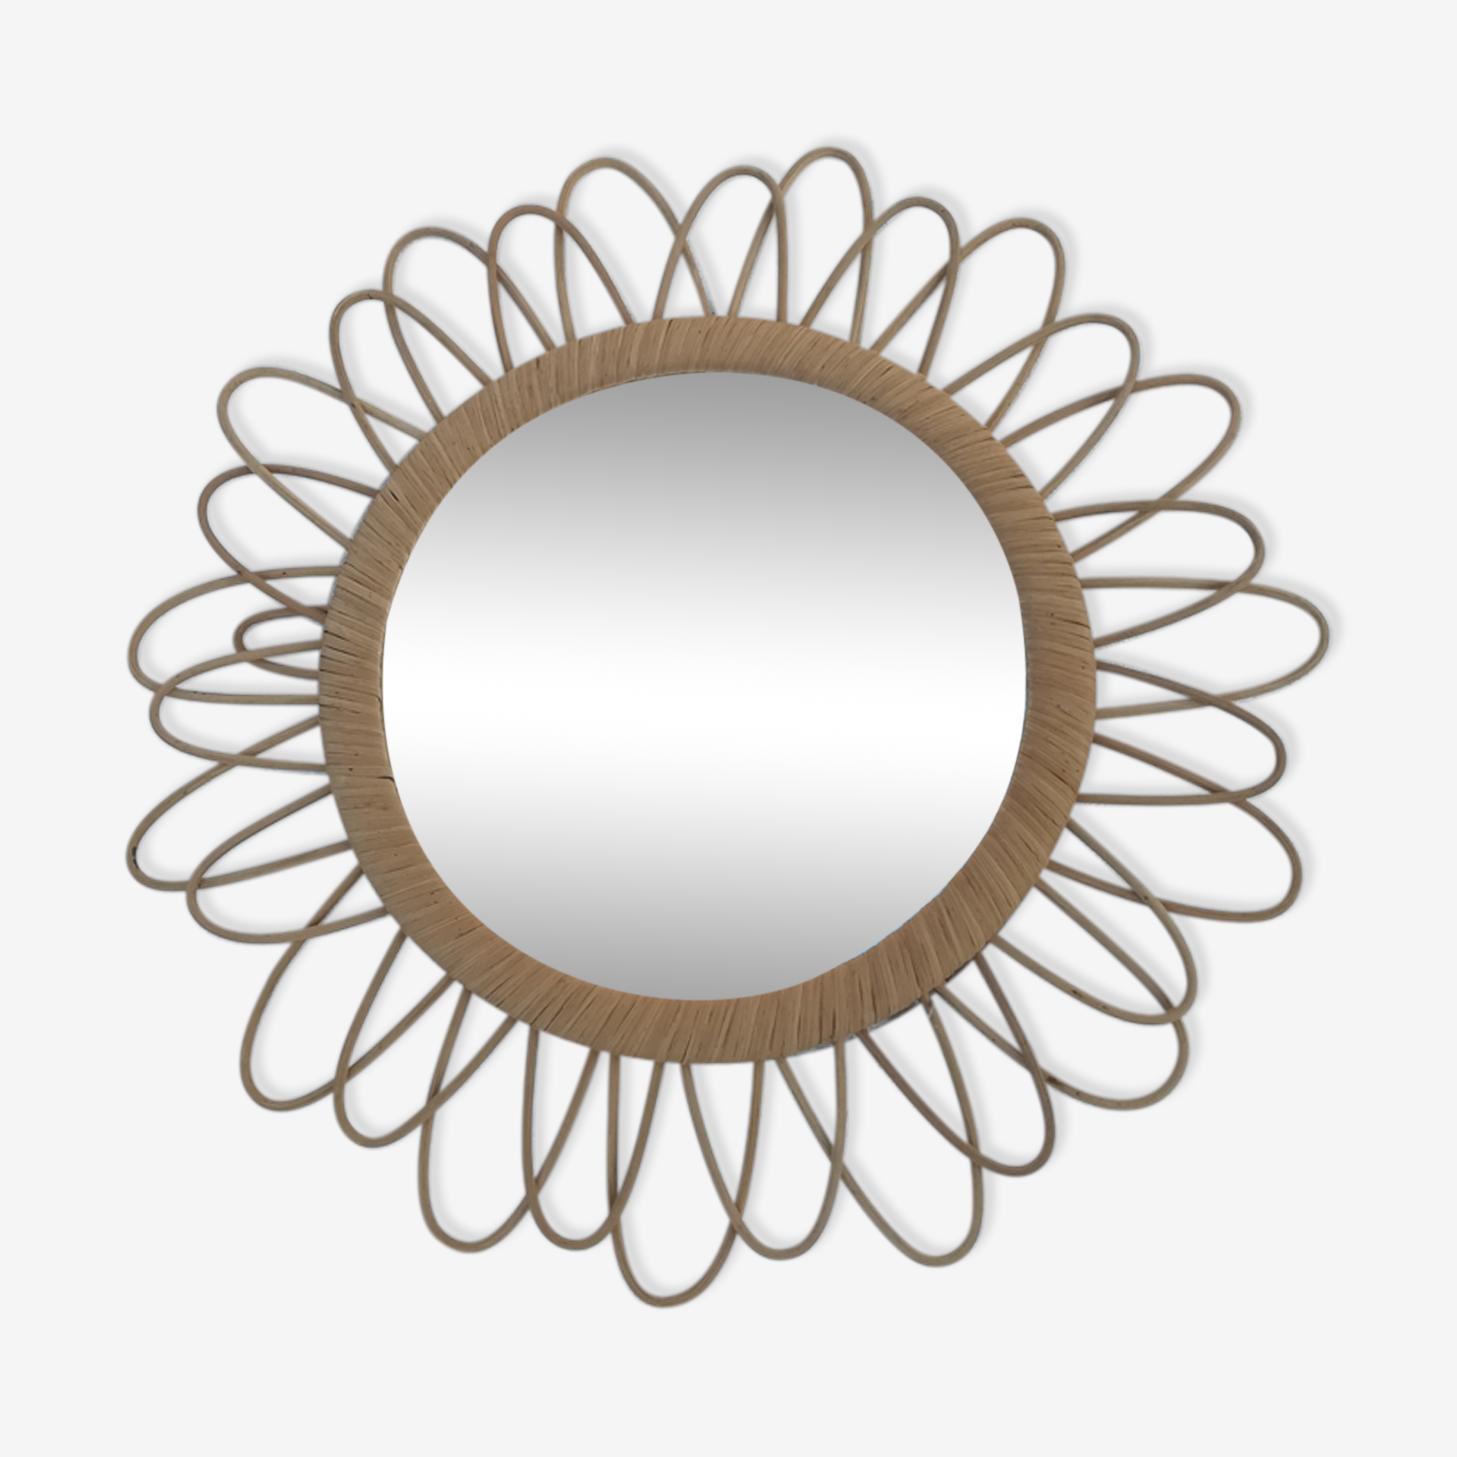 Miroir fleur en rotin vintage diam.47cm